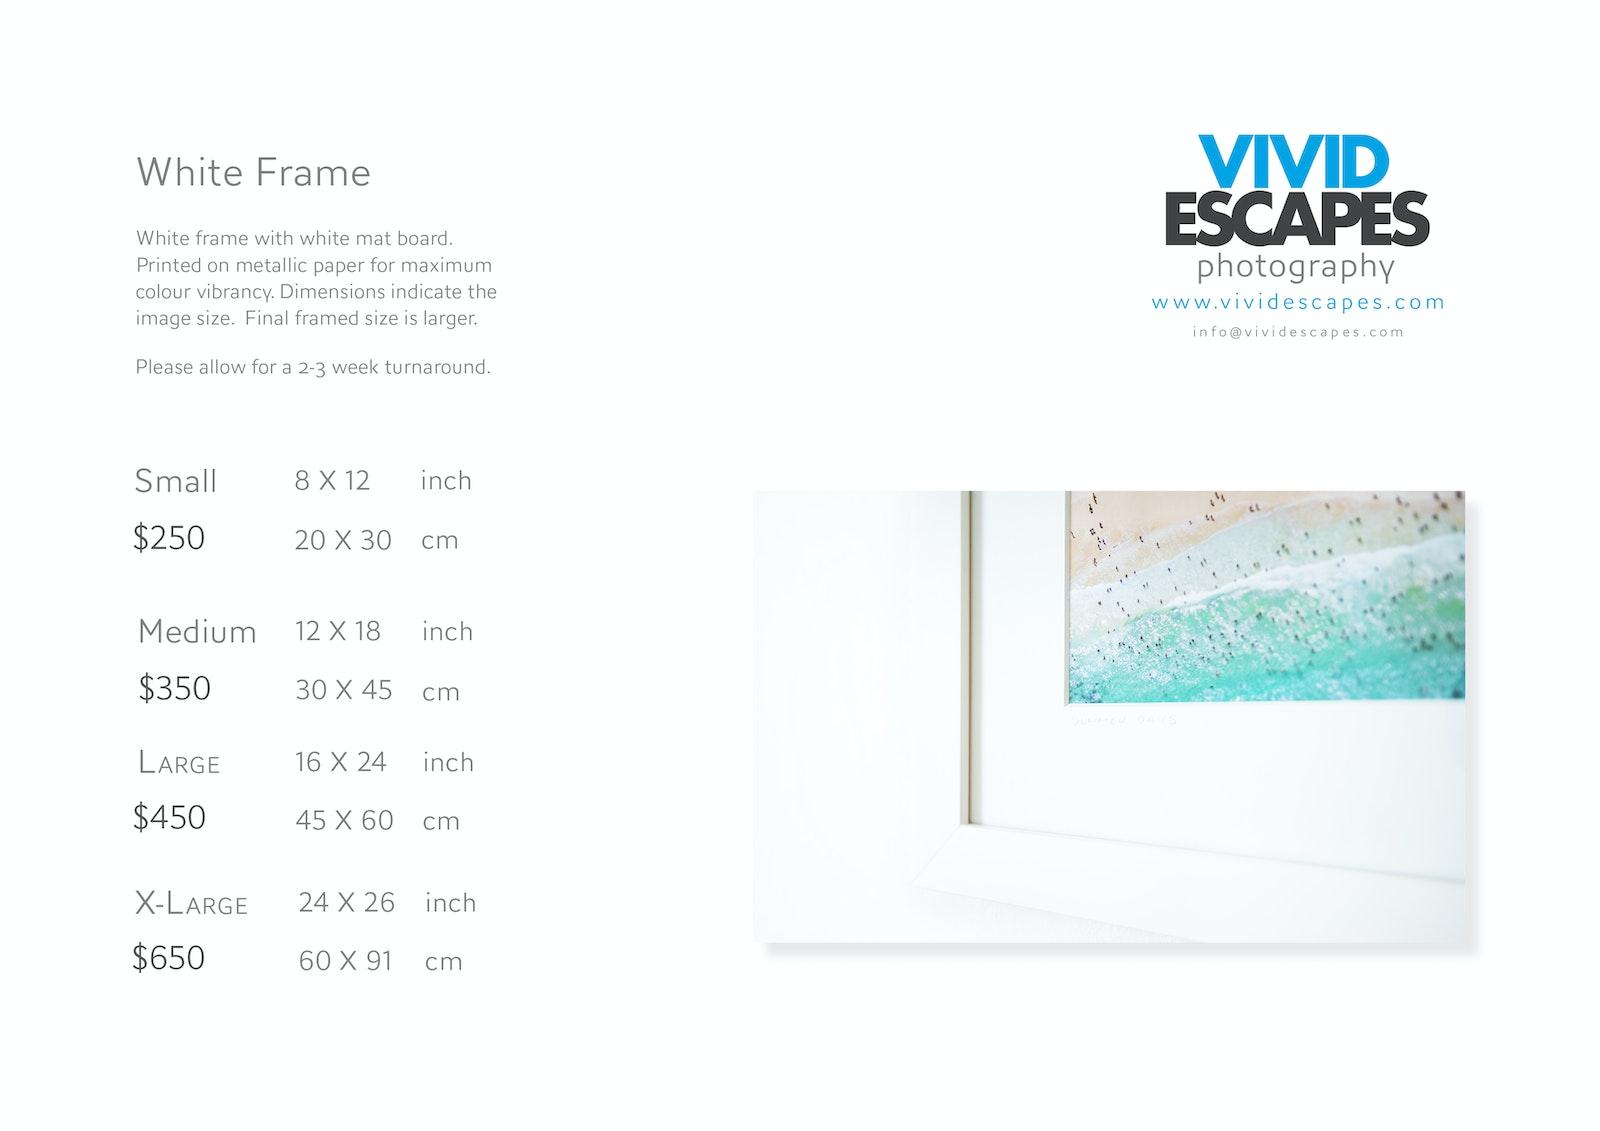 Vivid_Escapes_Price_List_NEW9